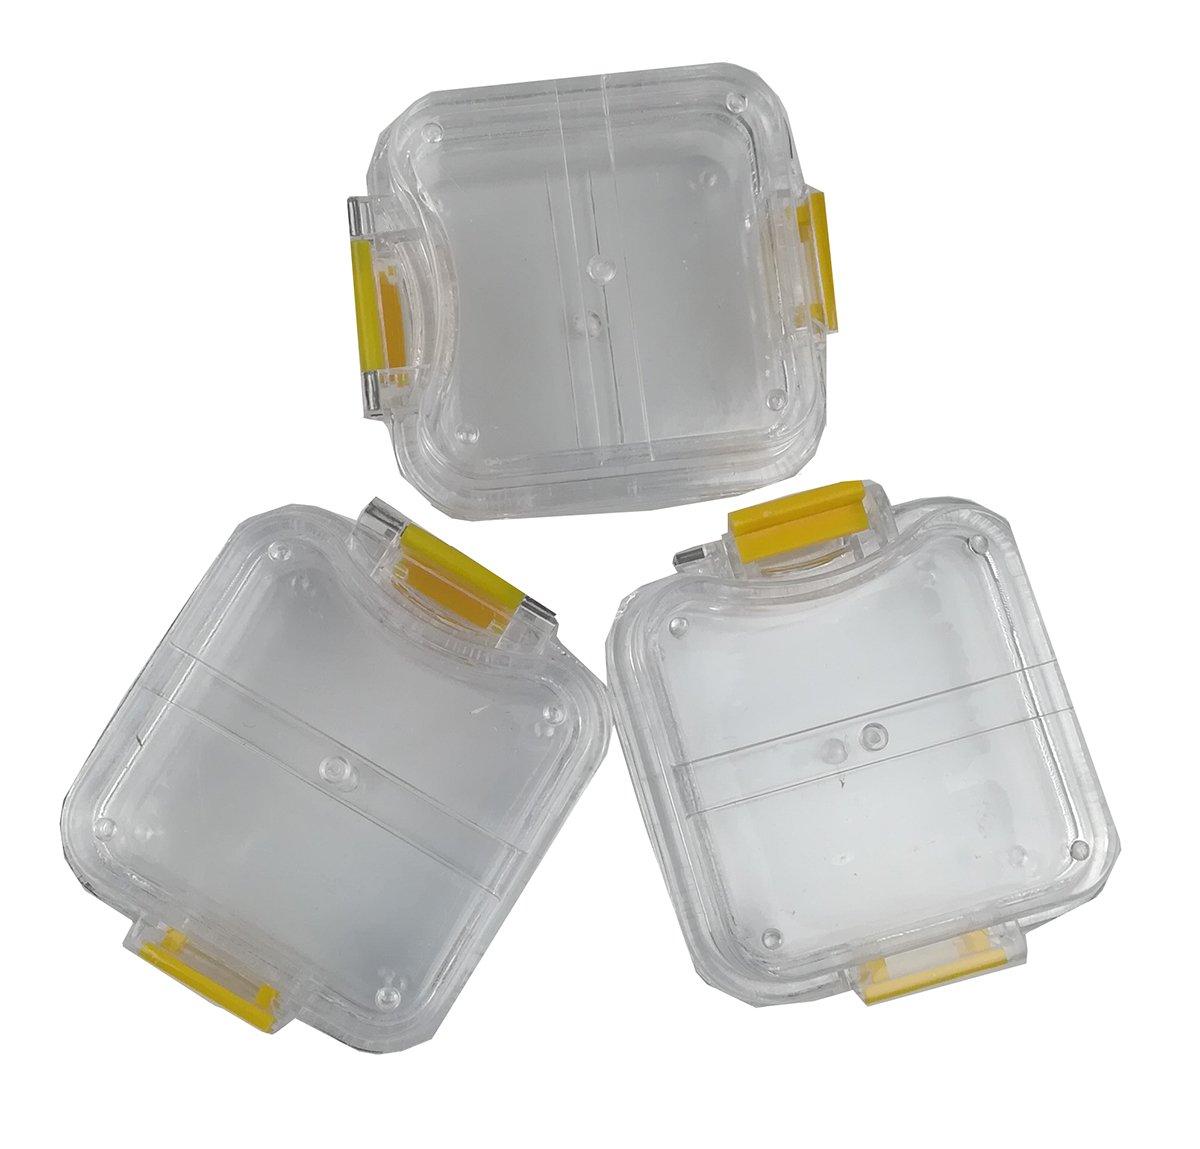 TJIRIS 100 Pcs Handmade Transparent Membrane Tooth Box with Film Dental Tool Denture Crown/Bridge Box for Dental Lab